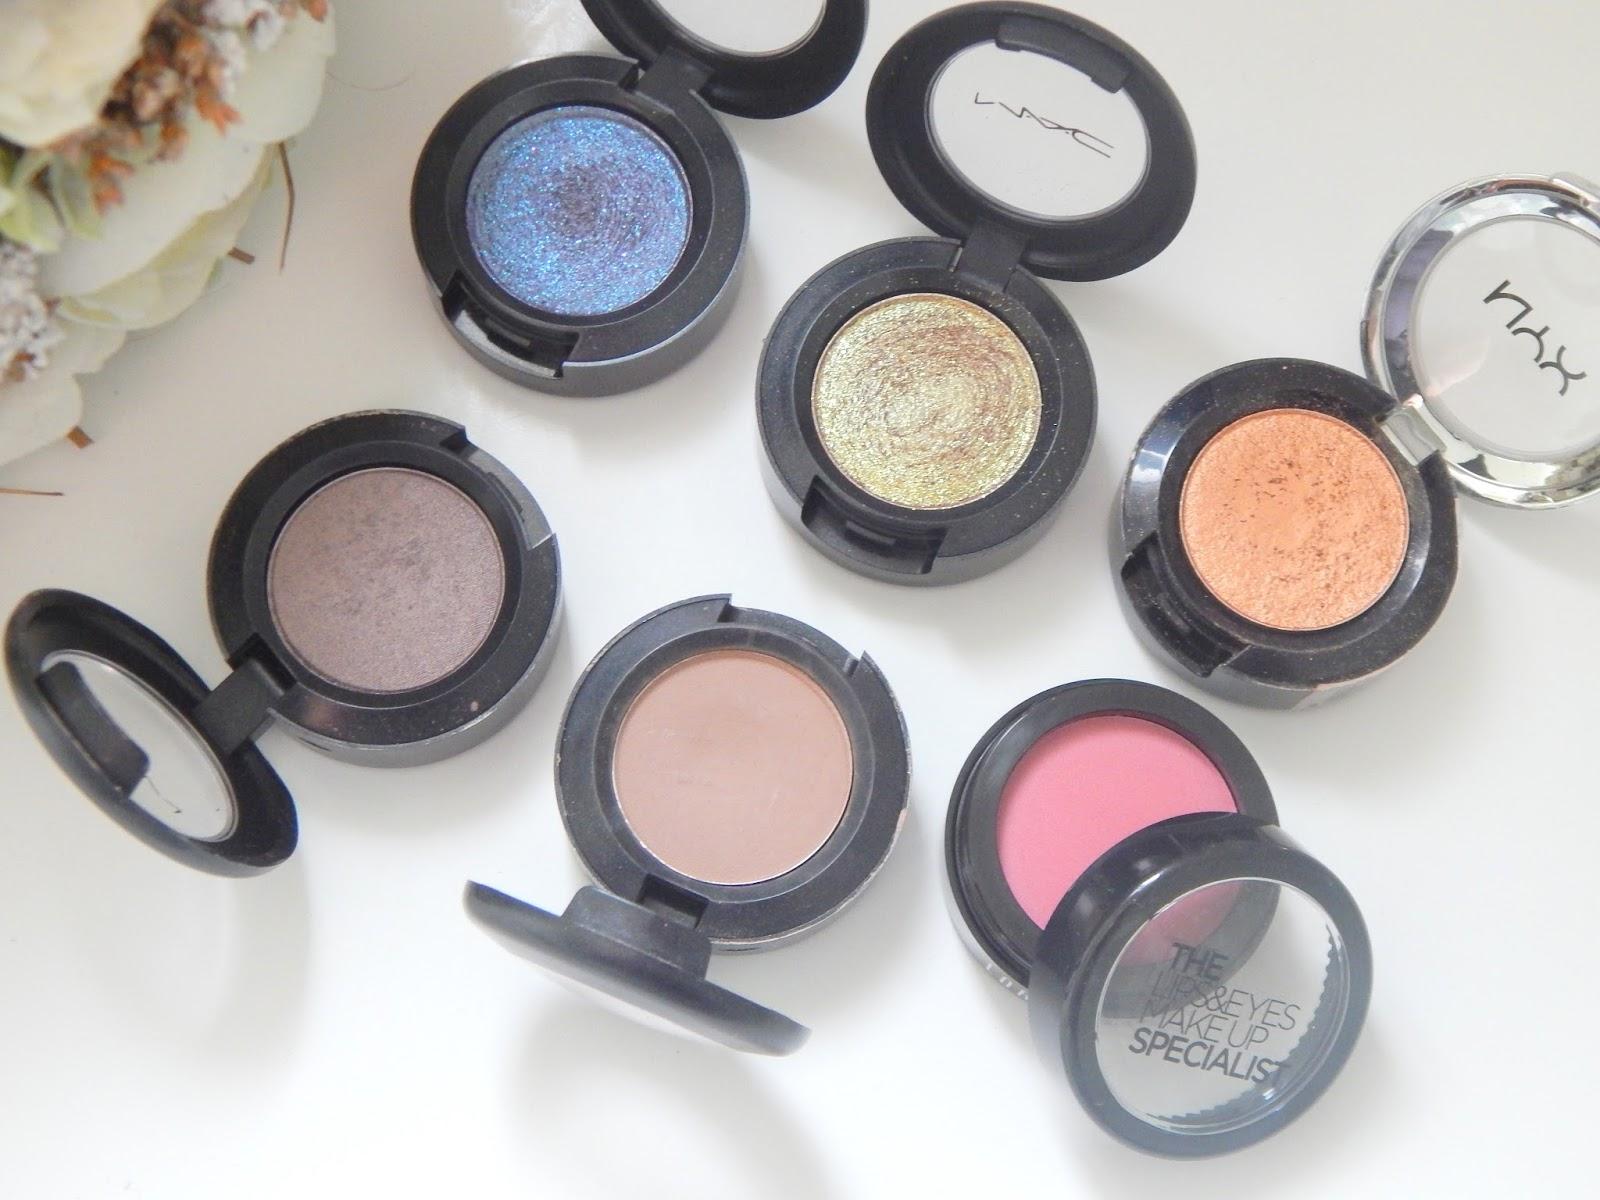 Inside The Makeup Drawers    Single Eyeshadows